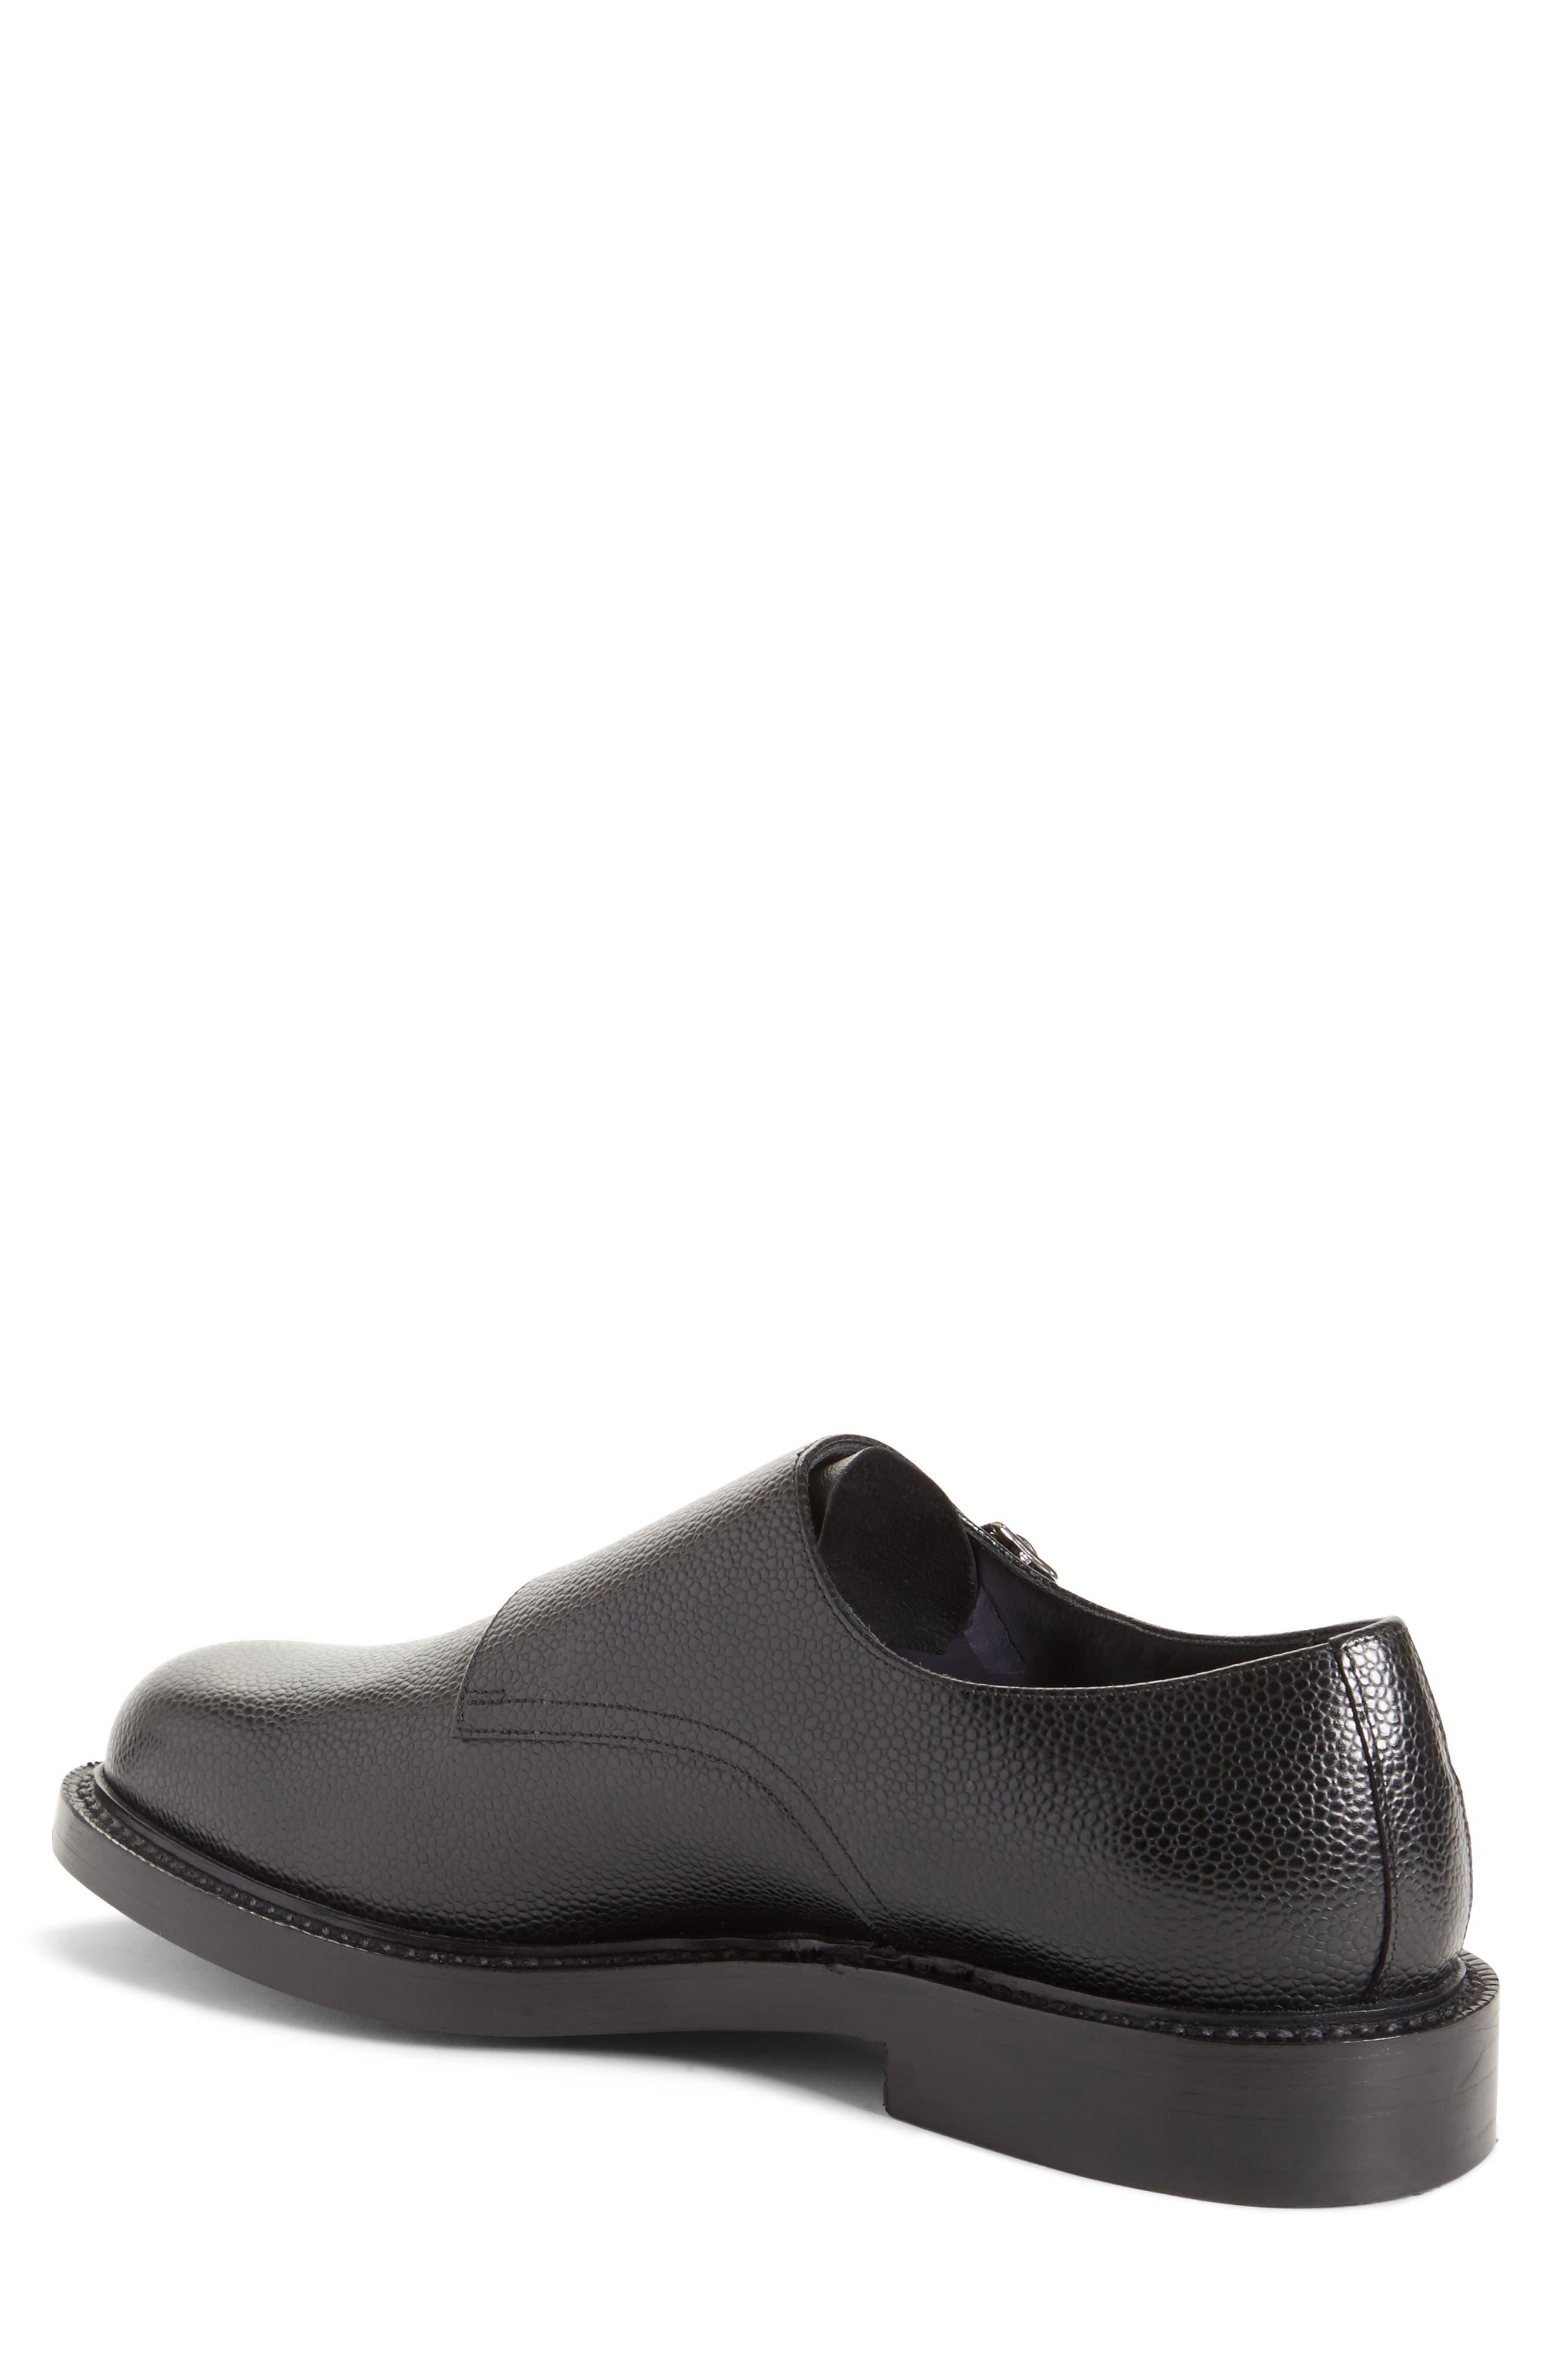 Hova Double Monk Strap Shoe,                             Alternate thumbnail 2, color,